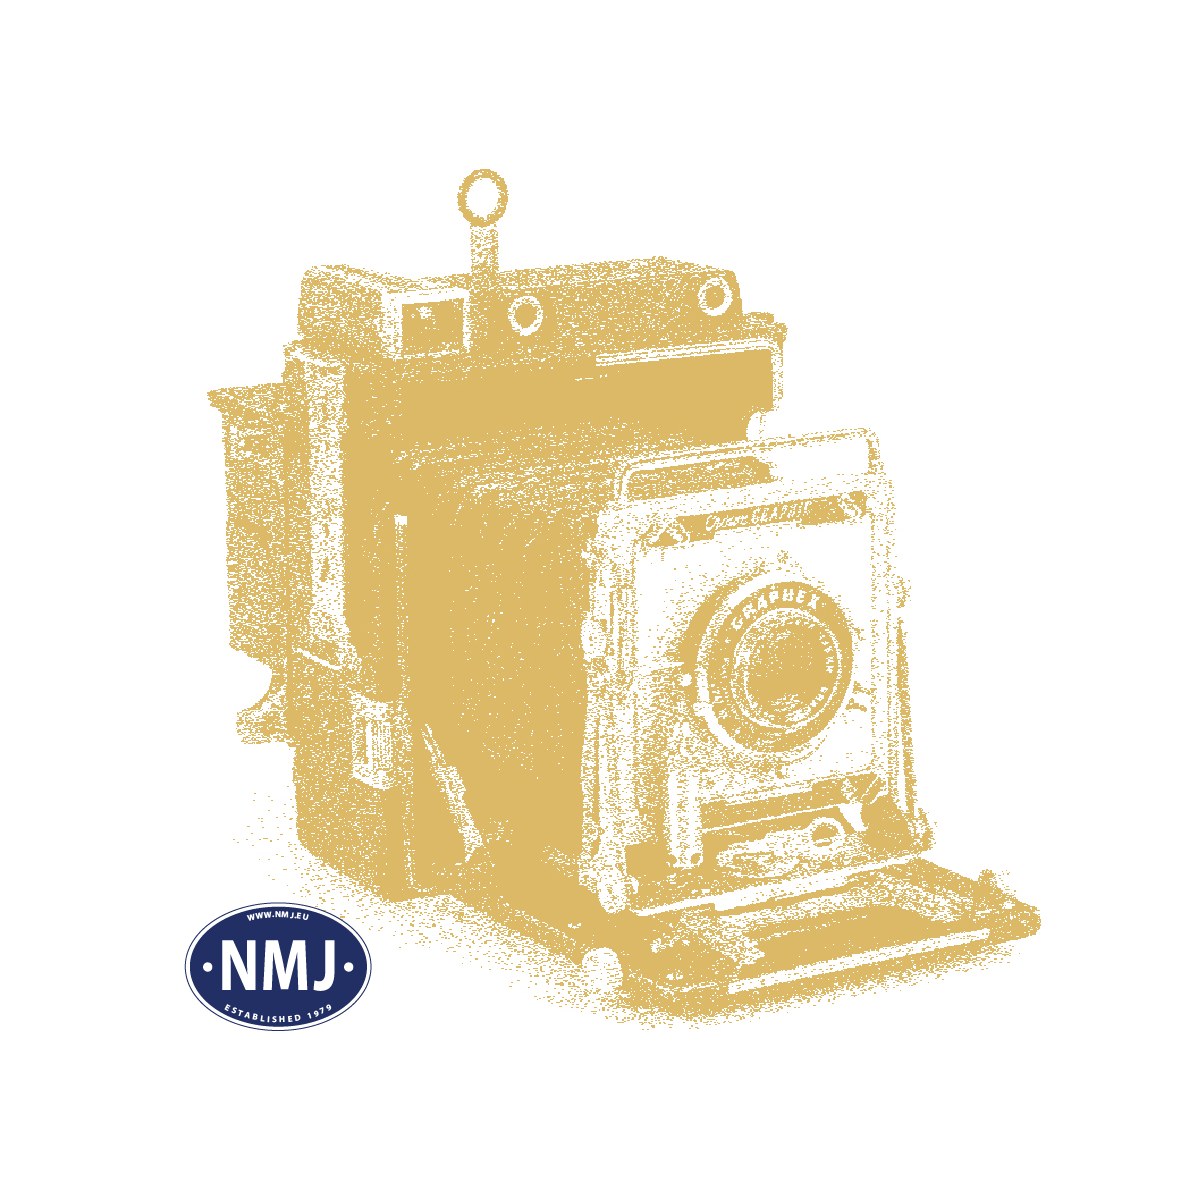 NMJT145001 - NMJ Topline NSB Di3b 641 Rotbraun, Spur 0, 1:45